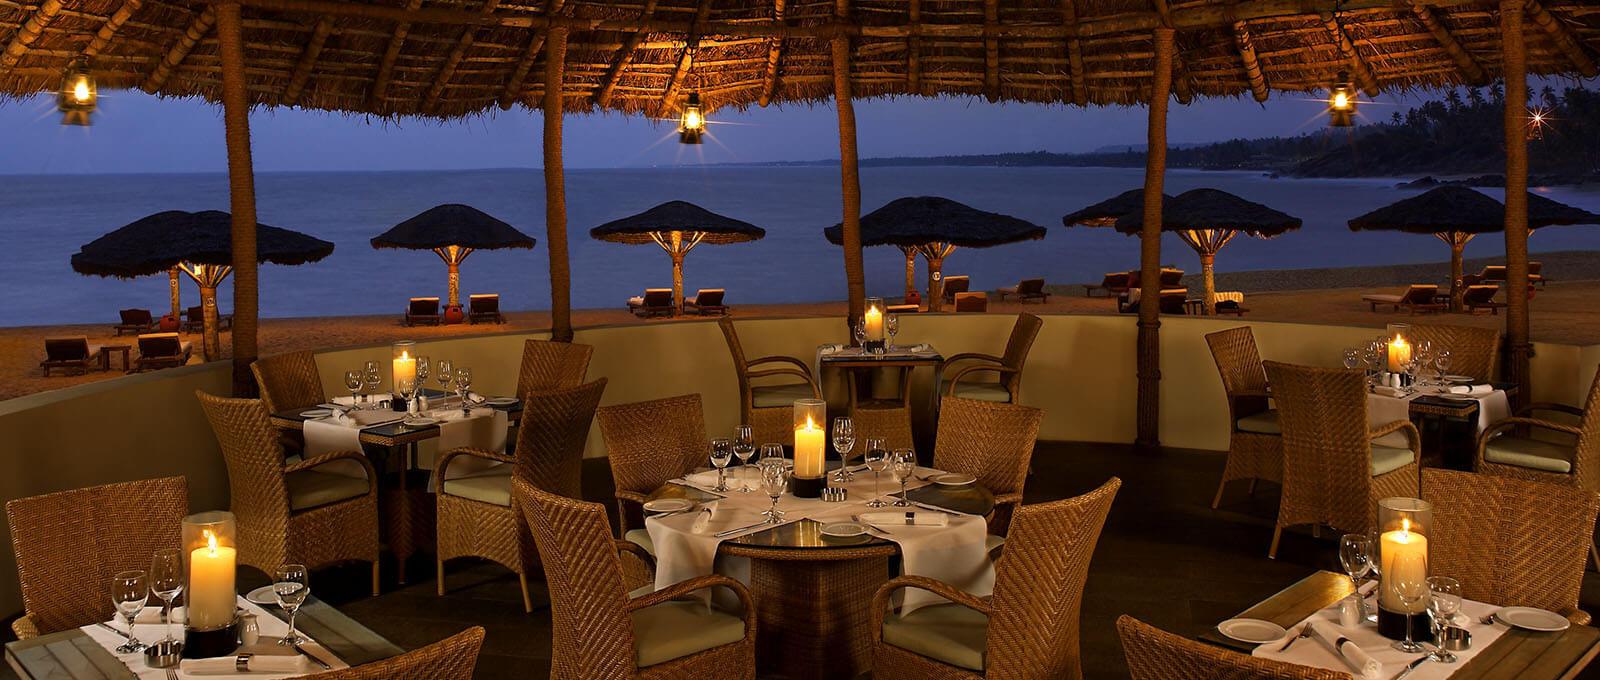 Tides Restaurant Interior